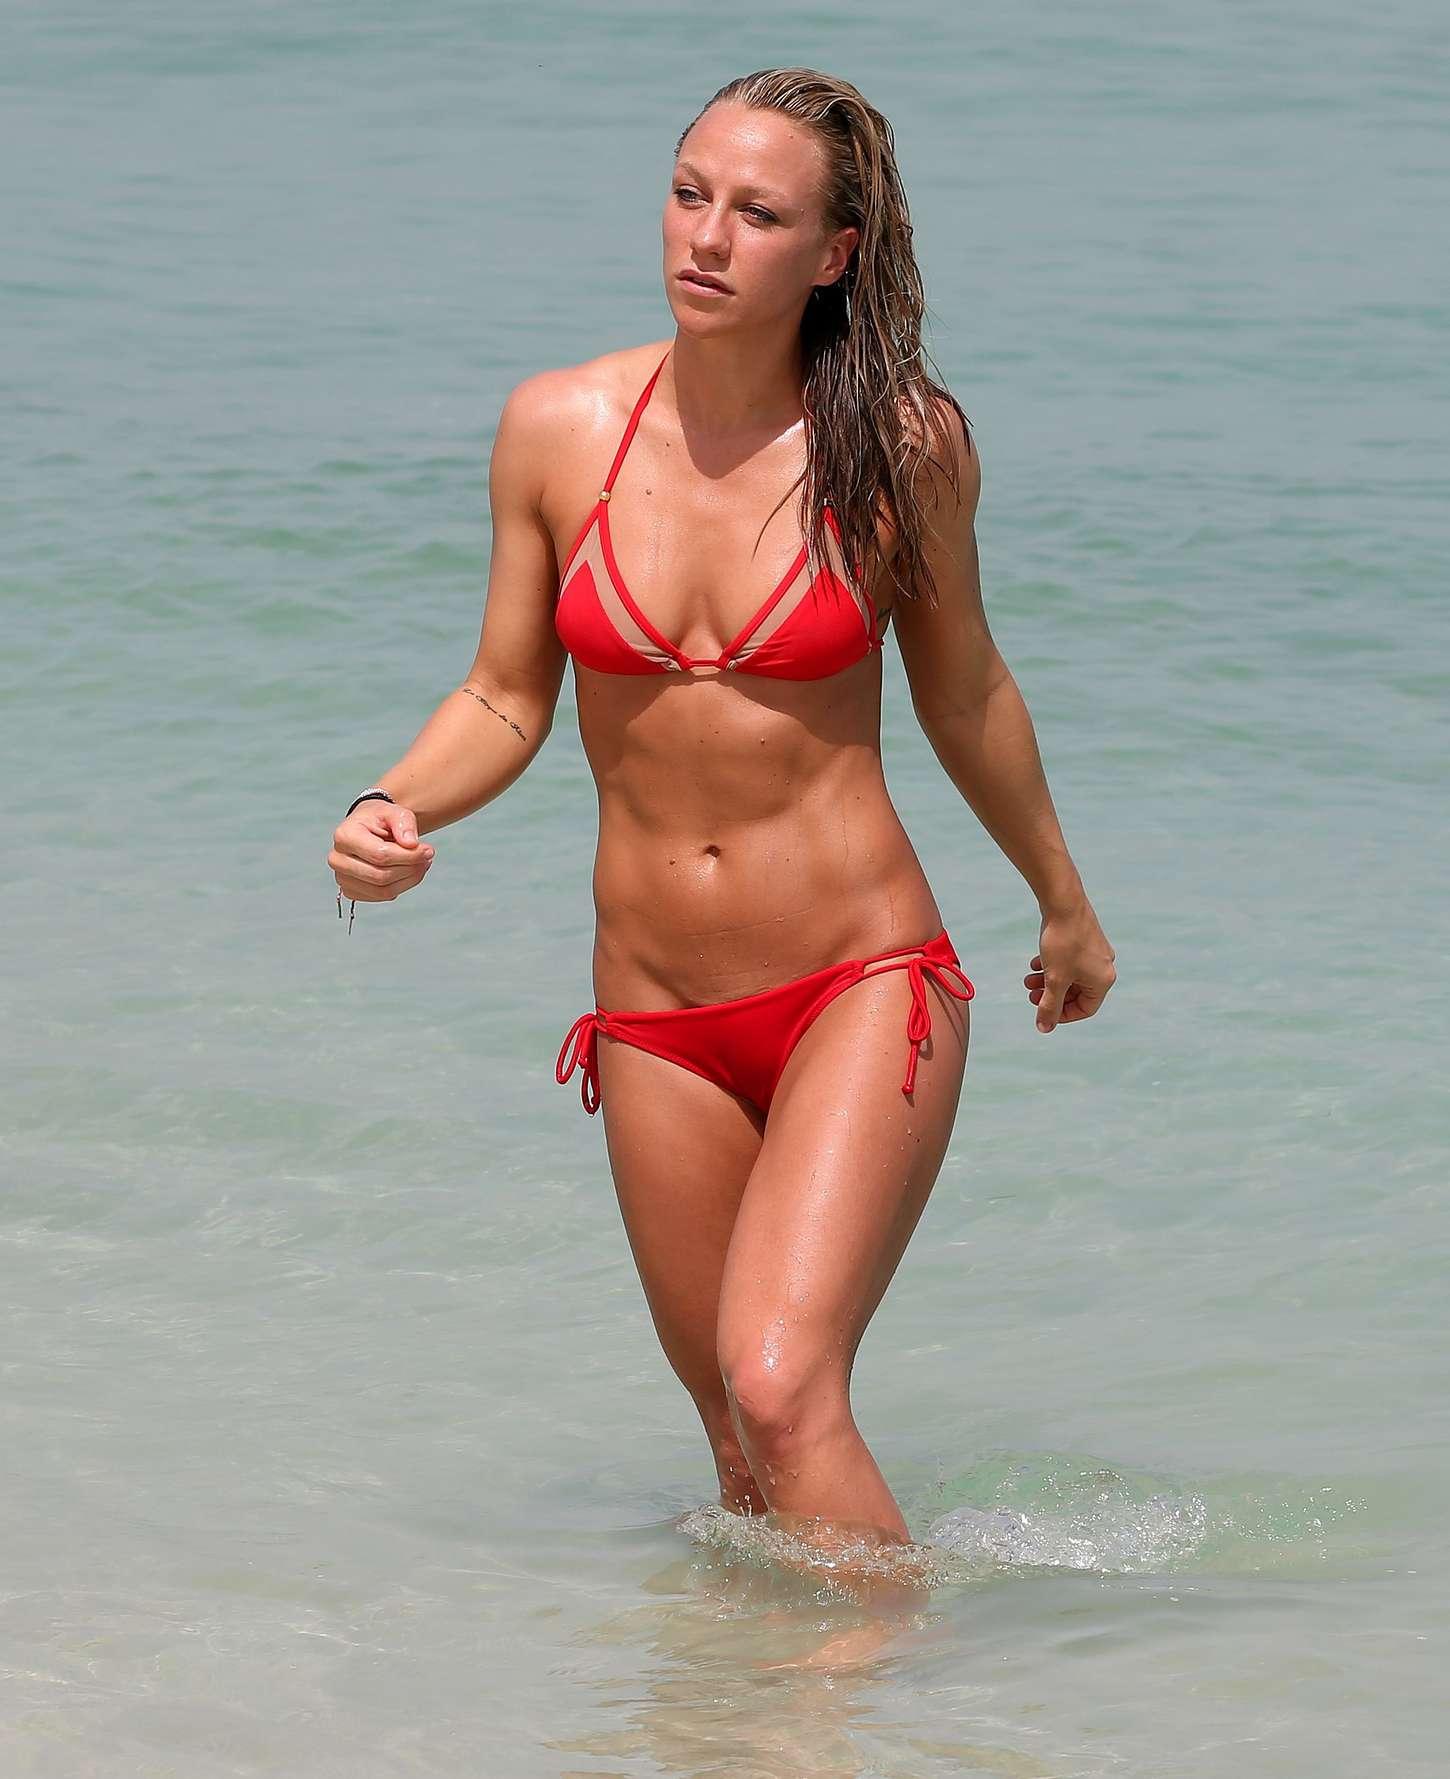 Ashanti tits,Kate Upton Boobie Tease Vid Porno image Kaya scodelario upskirt,Monika pietrasinska sexy